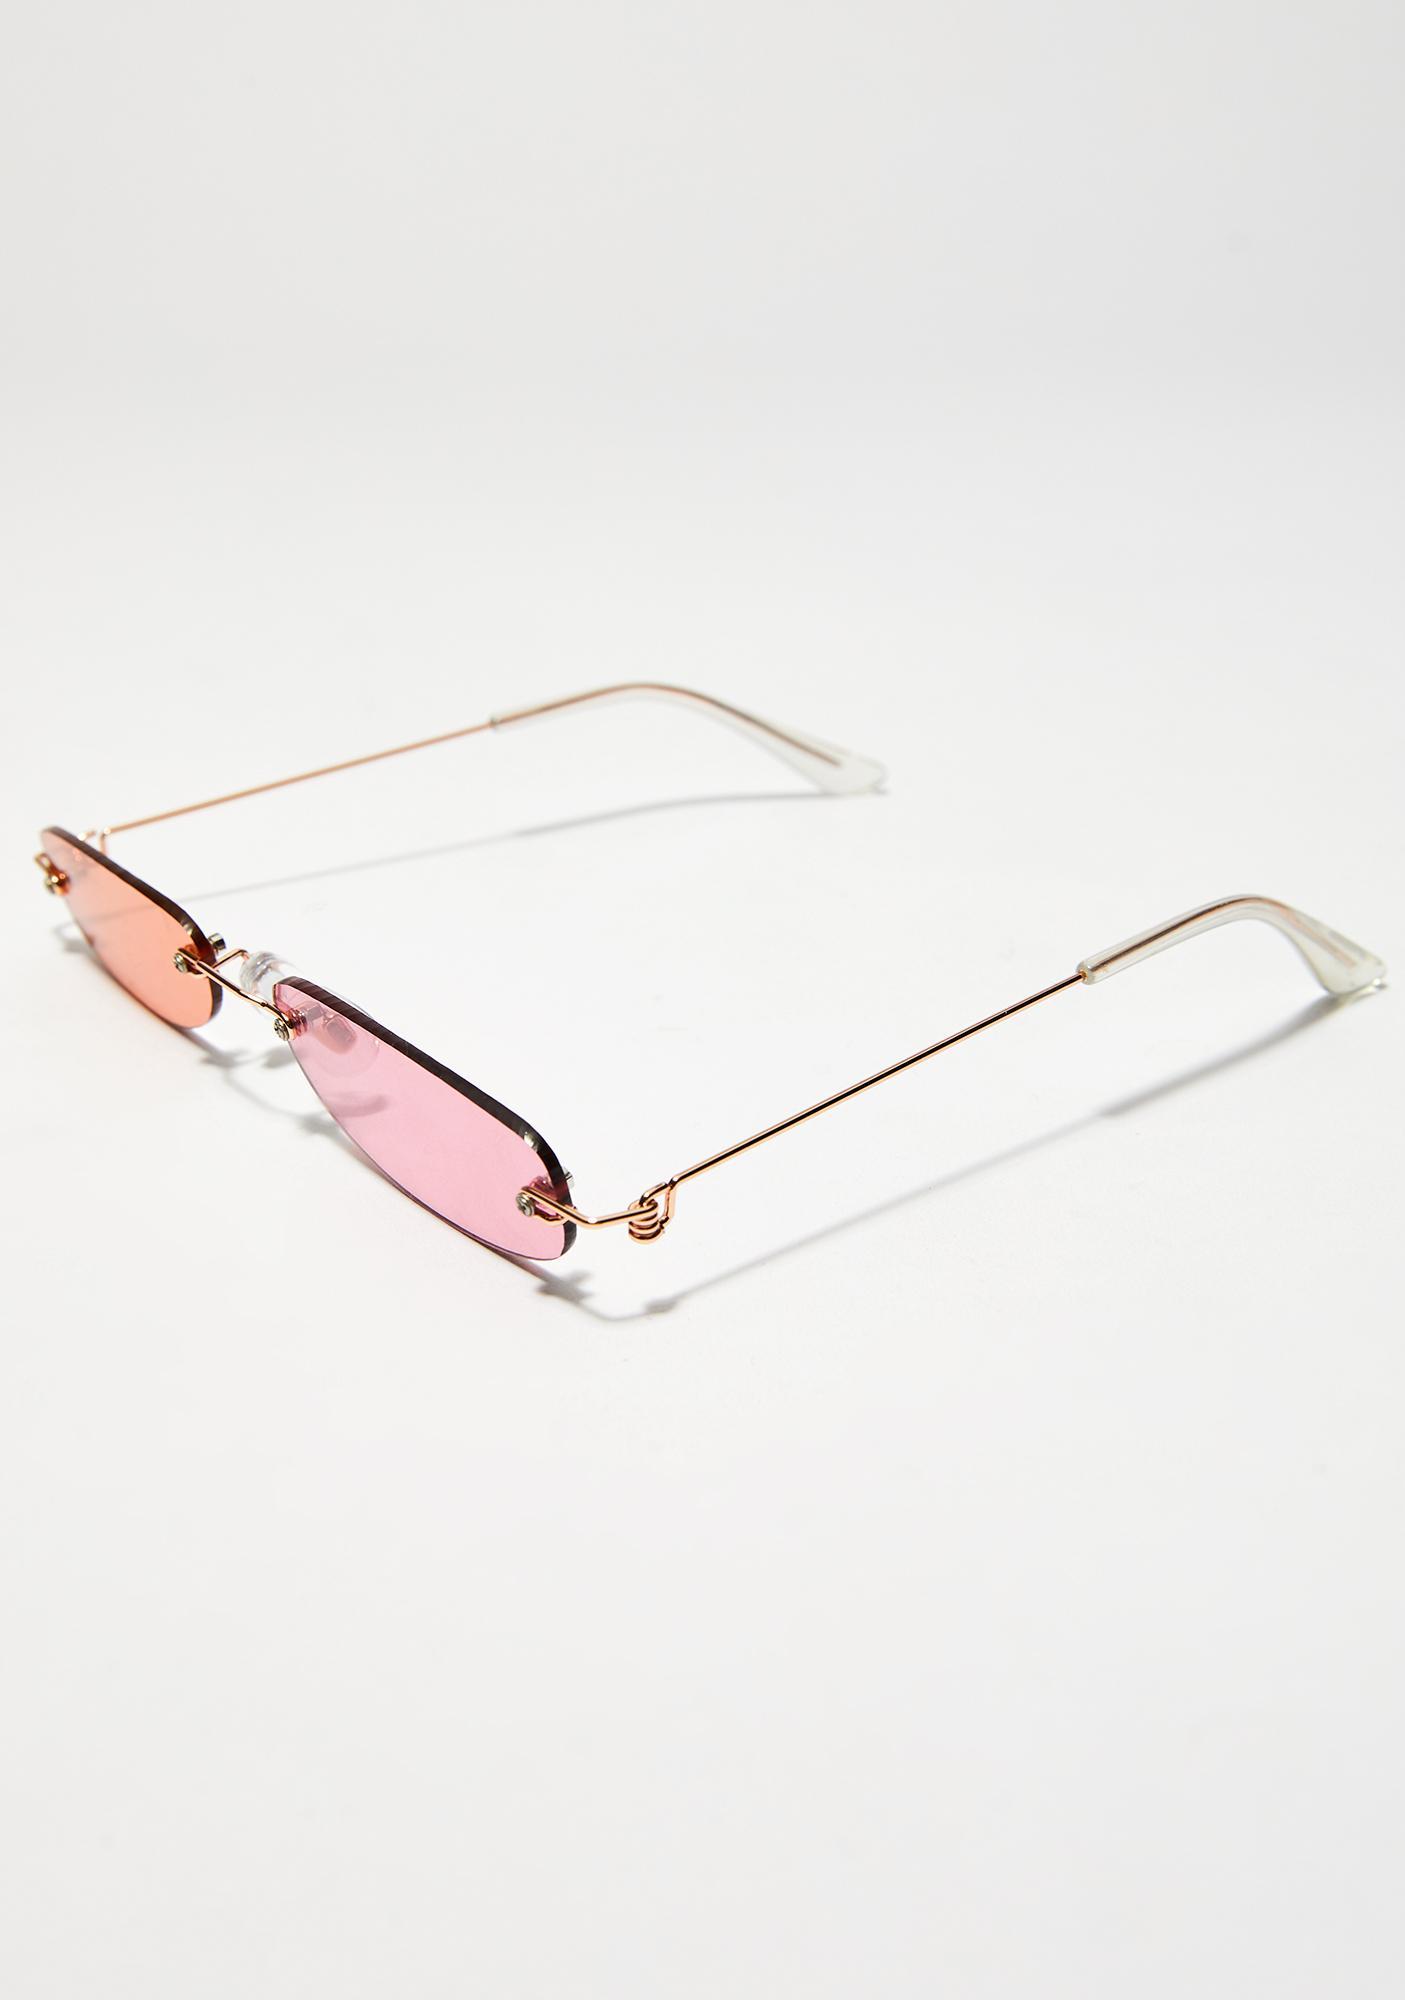 You Da Boss Sweet Skinny Sunglasses